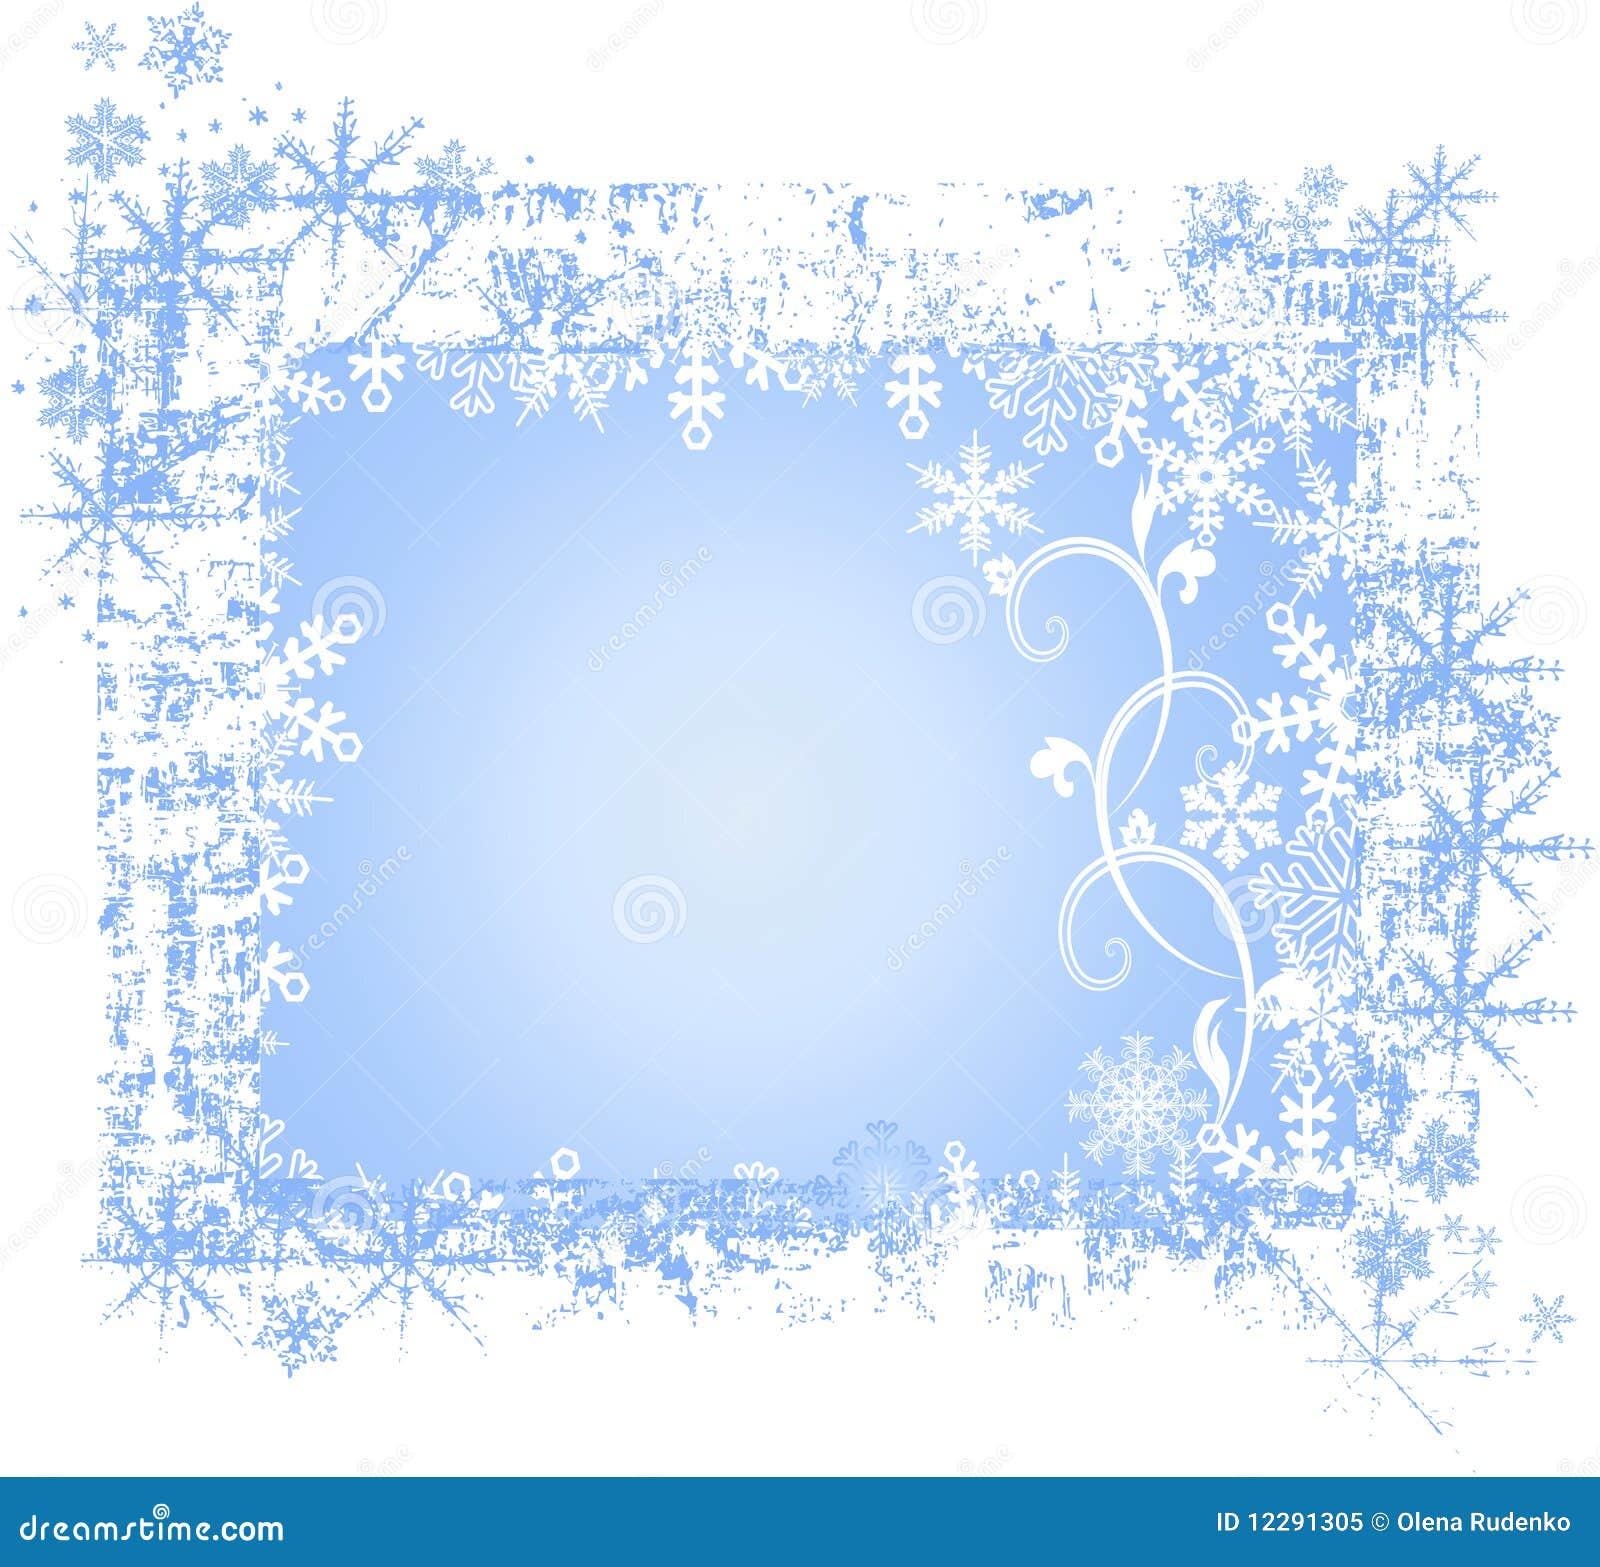 Frosty background royalty free stock photo image 12291305